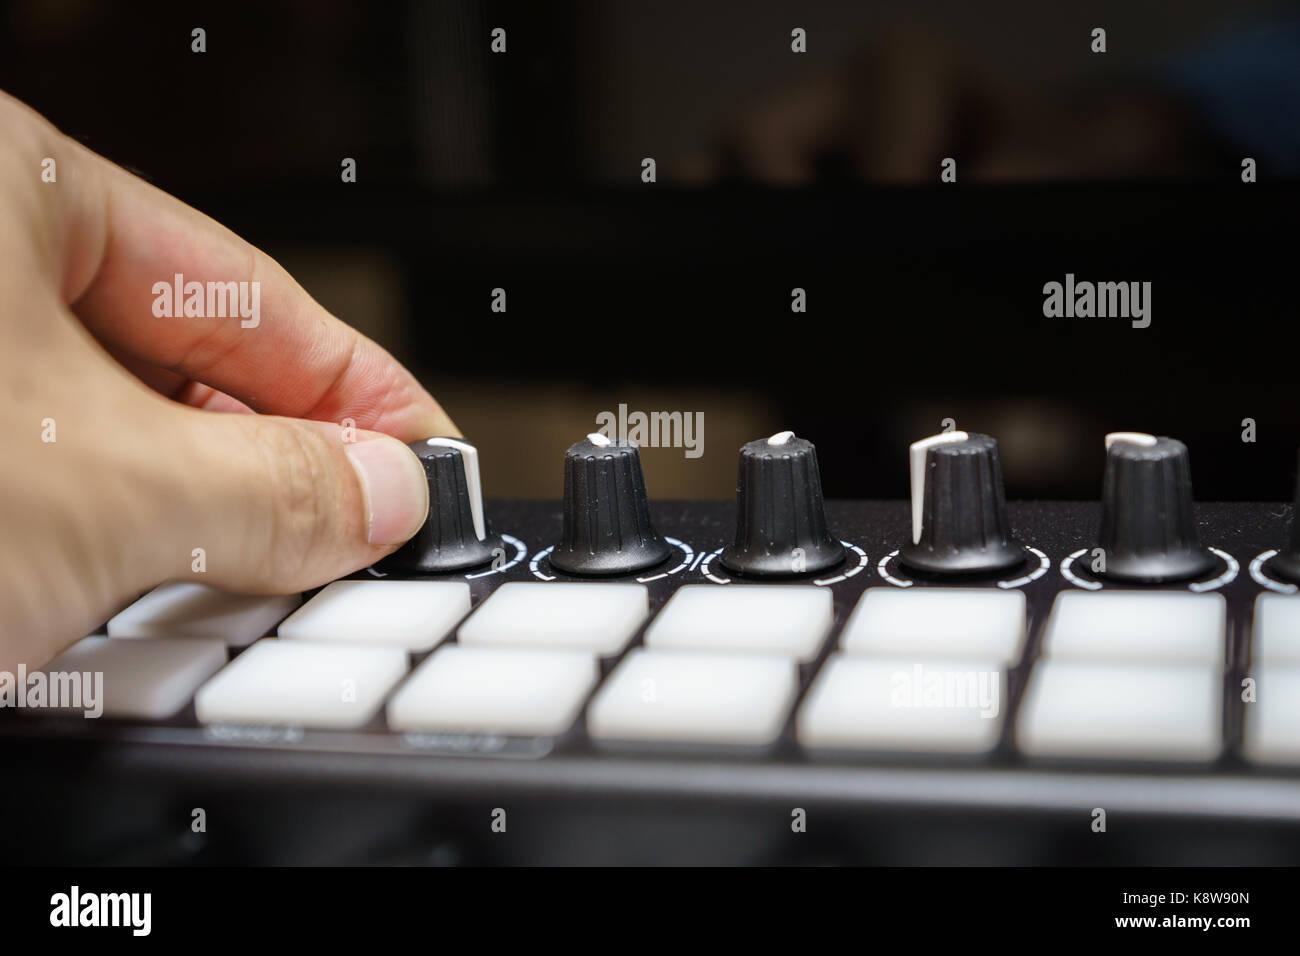 MIDI keyboard synthesizer piano keys closeup for electronic music production / recording - Stock Image